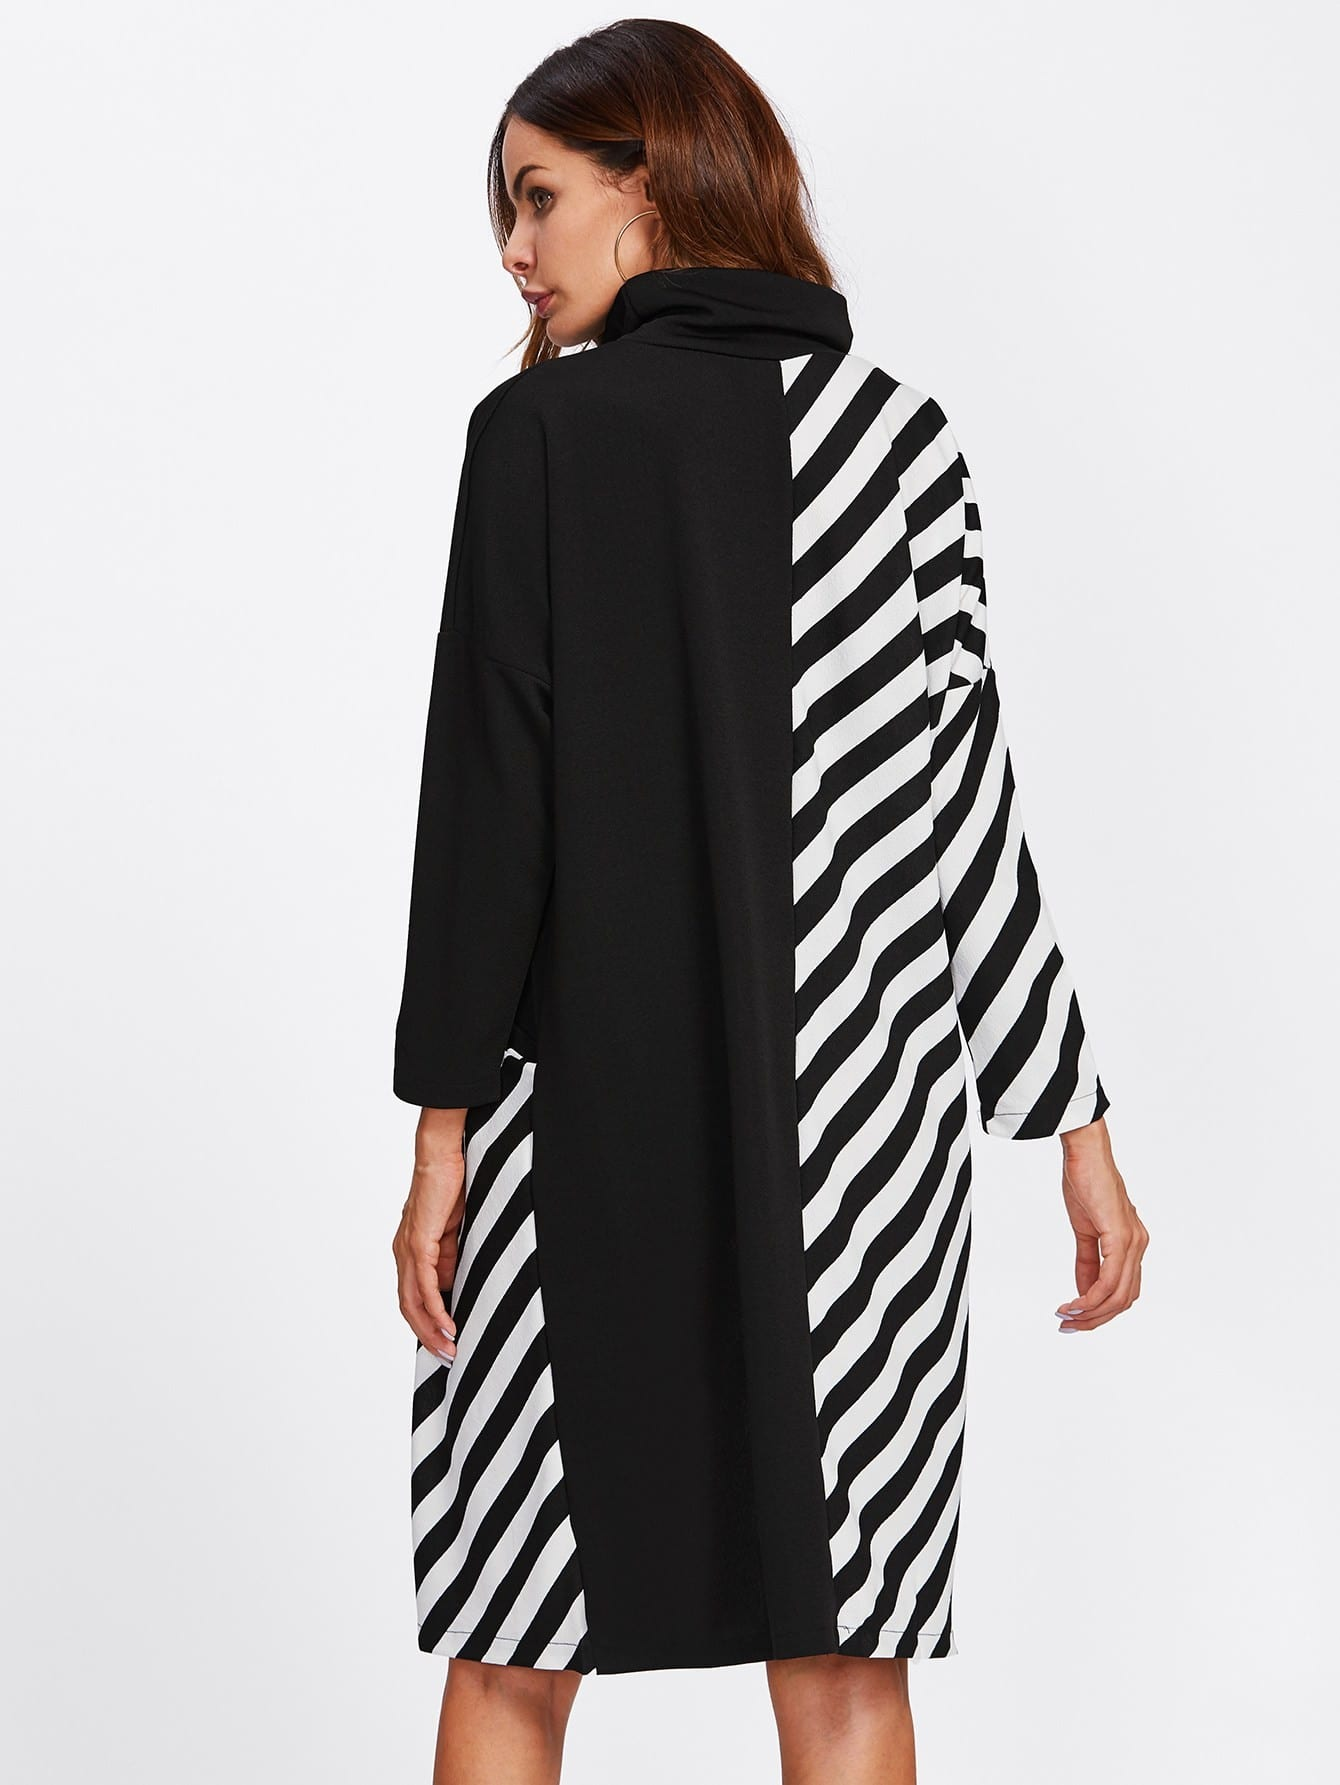 High Neck Contrast Striped Shift Dress